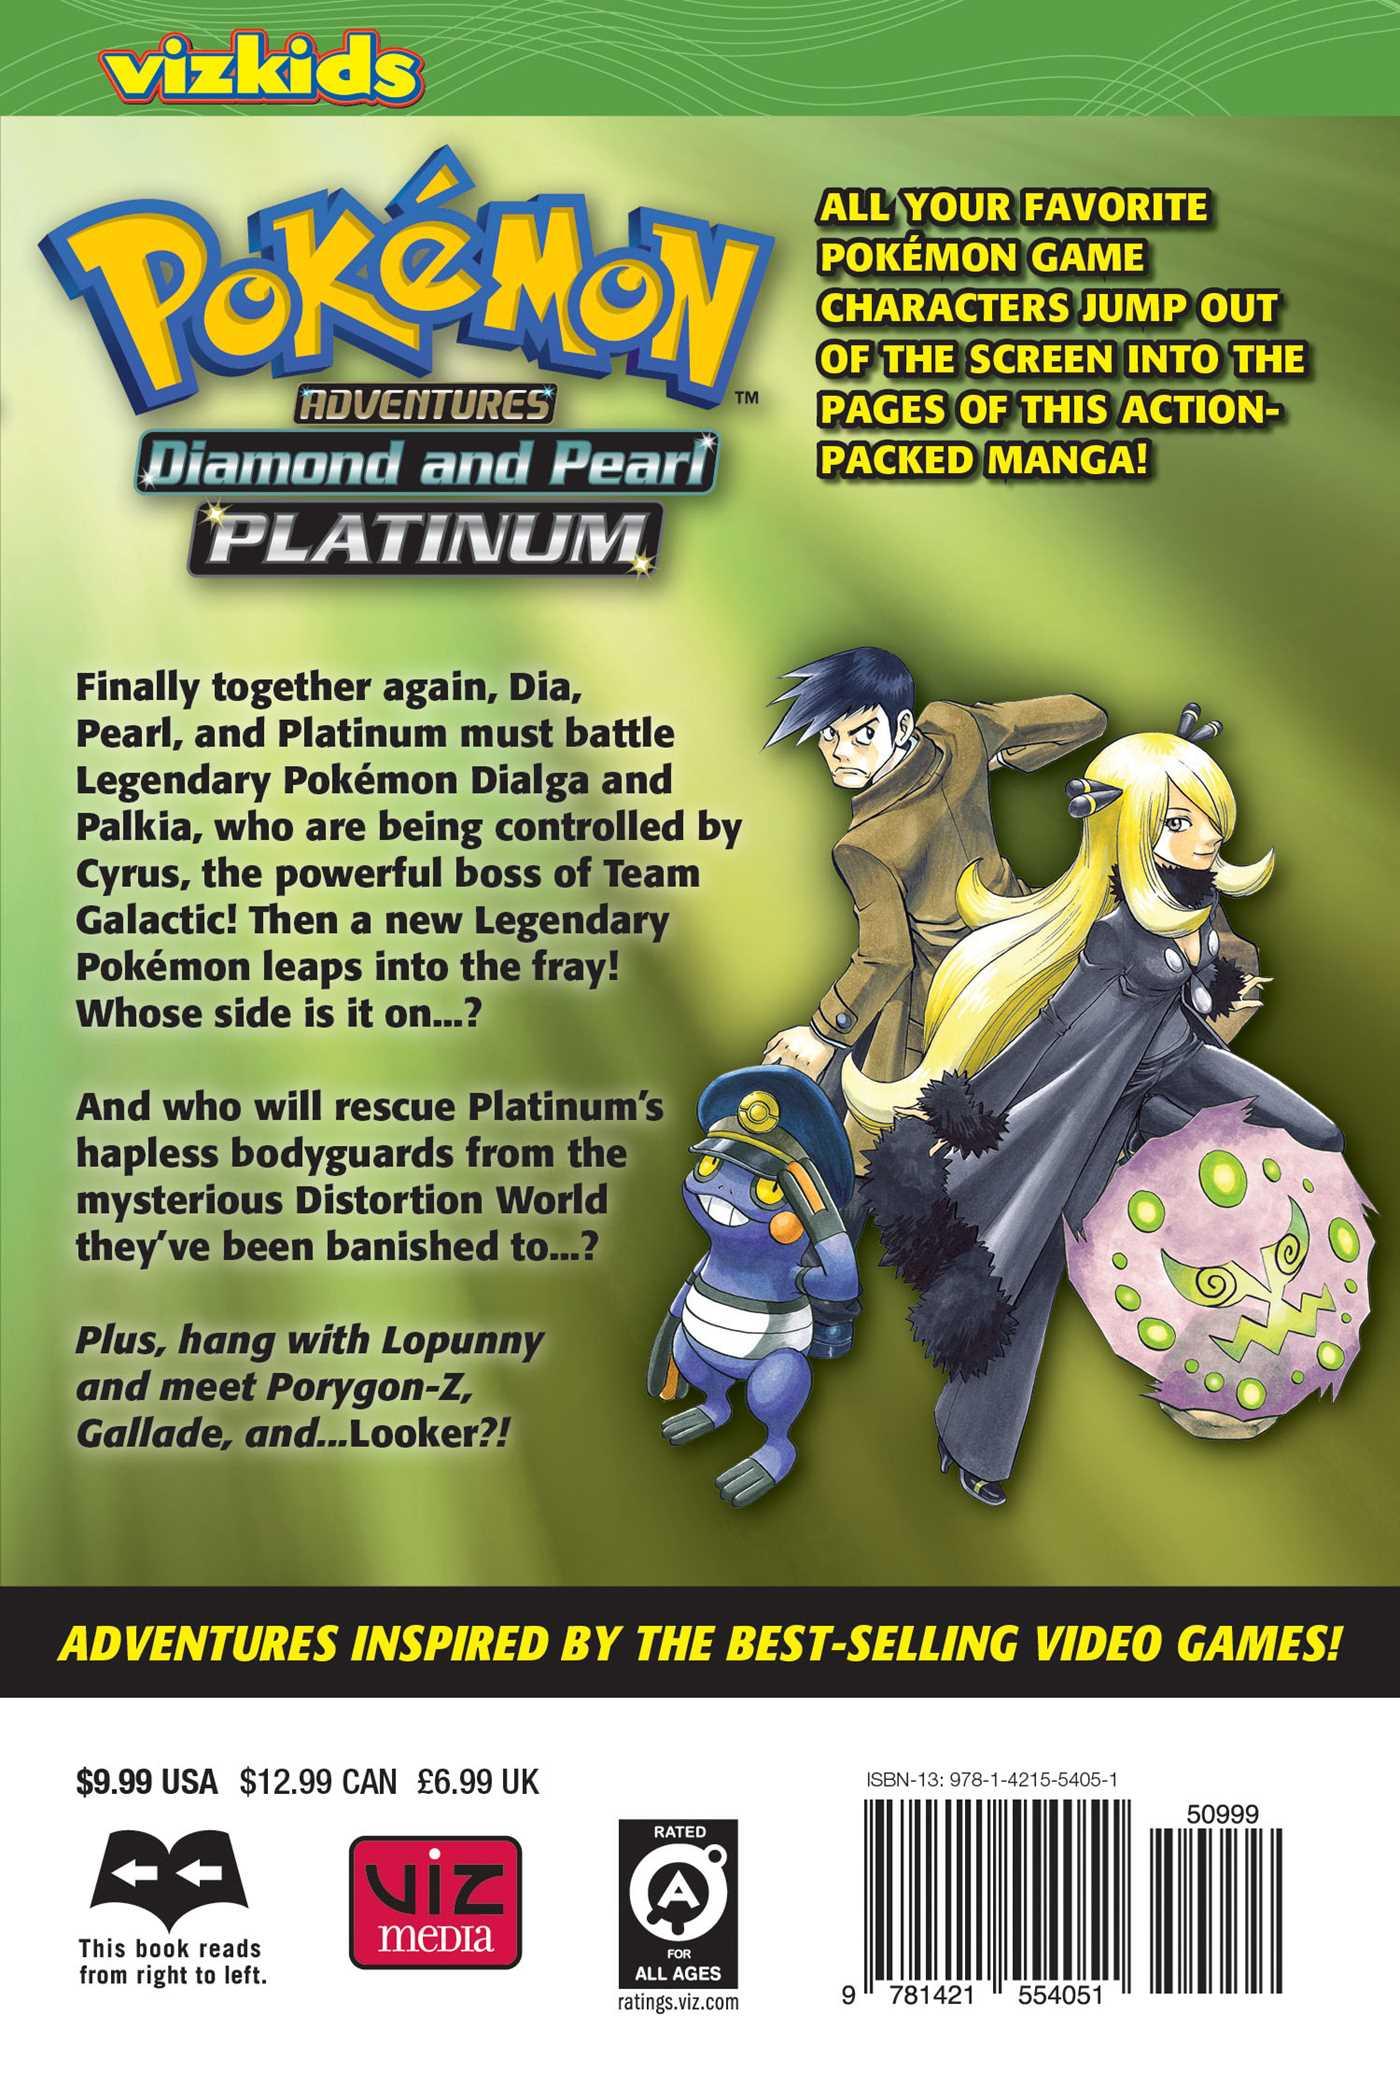 Pokmon adventures diamond and pearlplatinum vol 9 book by pokemon adventures diamond and pearl platinum vol 9 9781421554051 hr back gumiabroncs Images